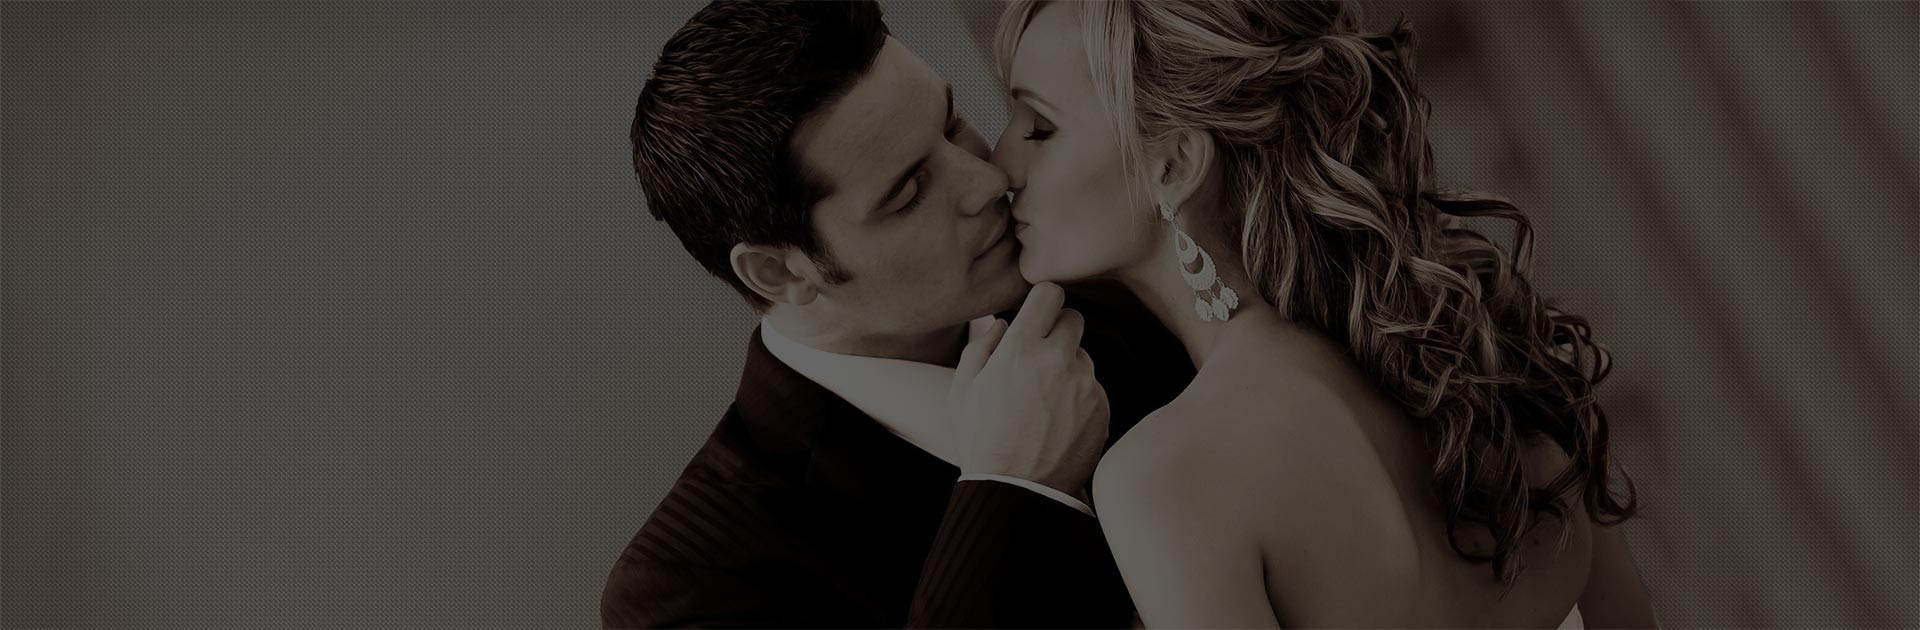 знакомства всокирянах для брака